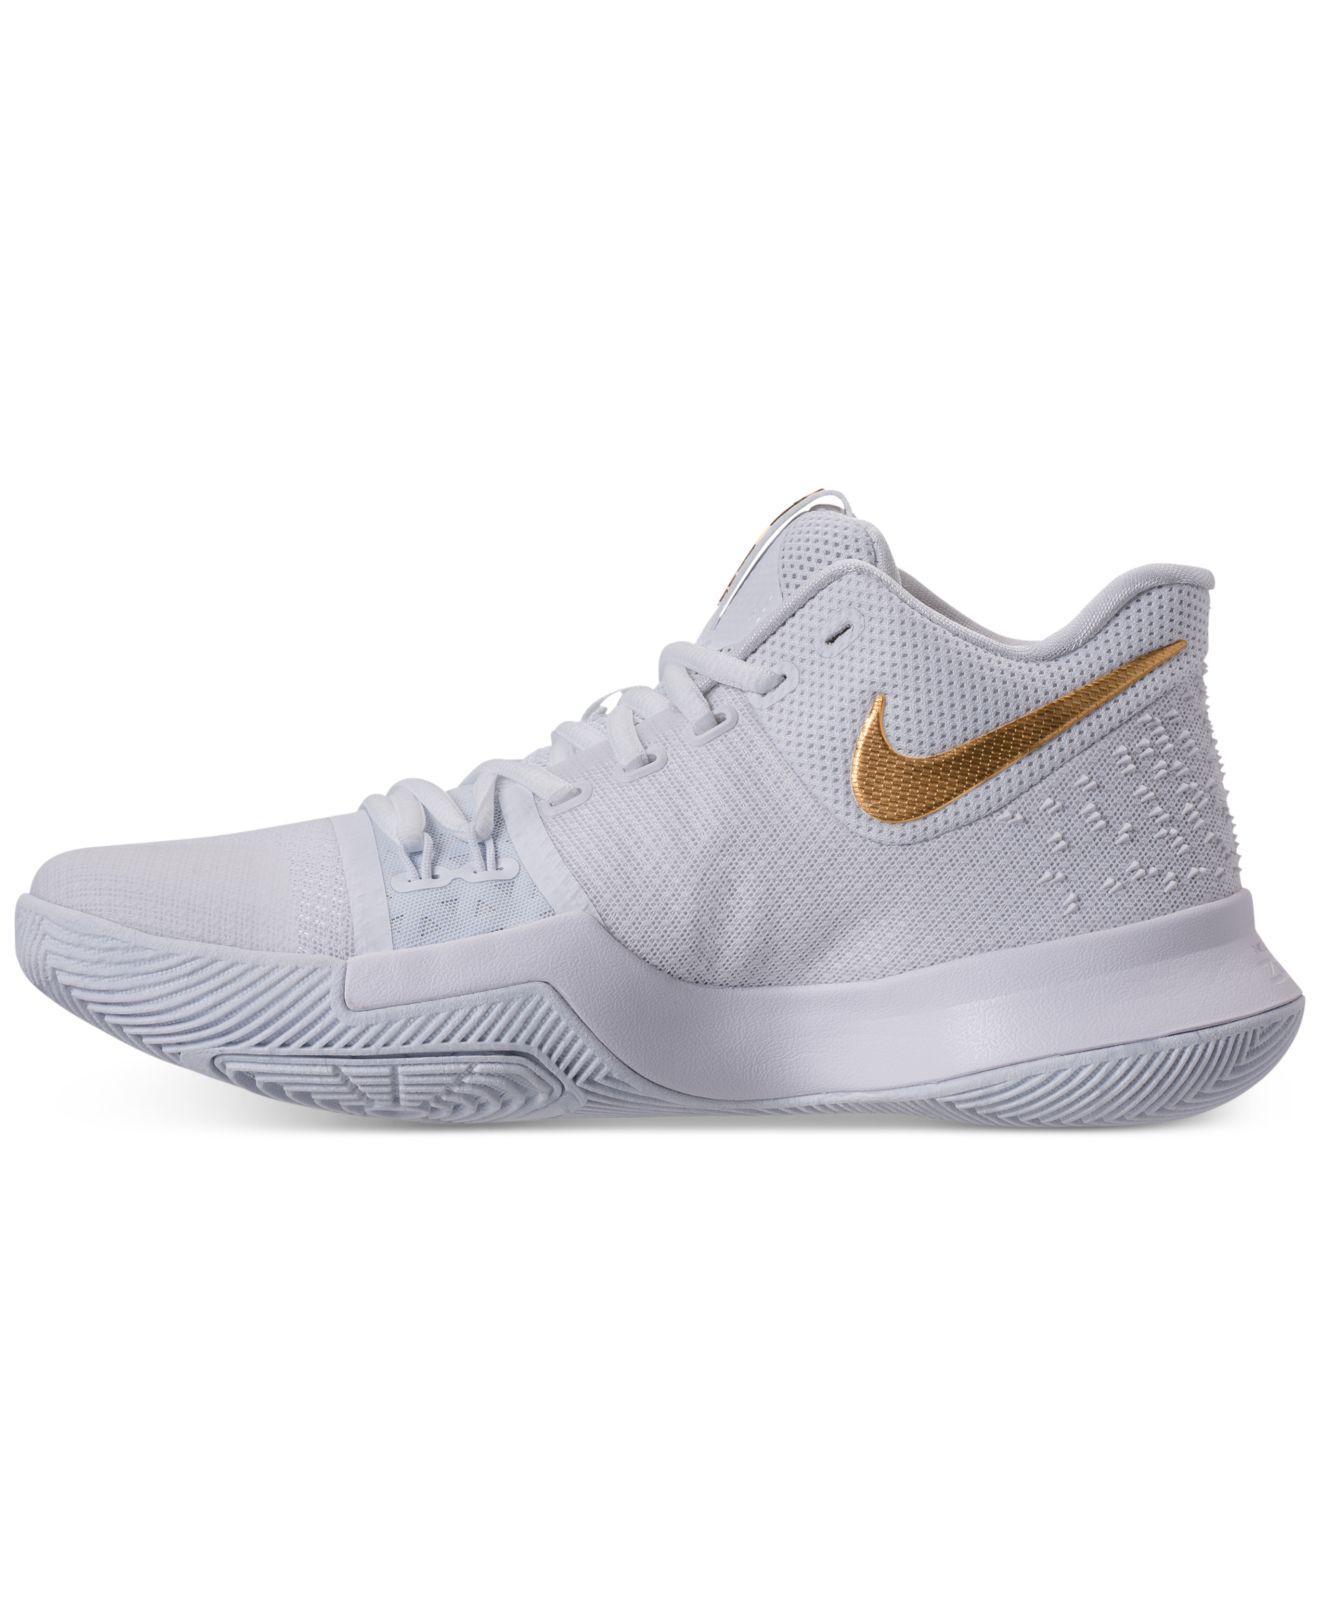 Nike Synthetic Kyrie 3 Basketball